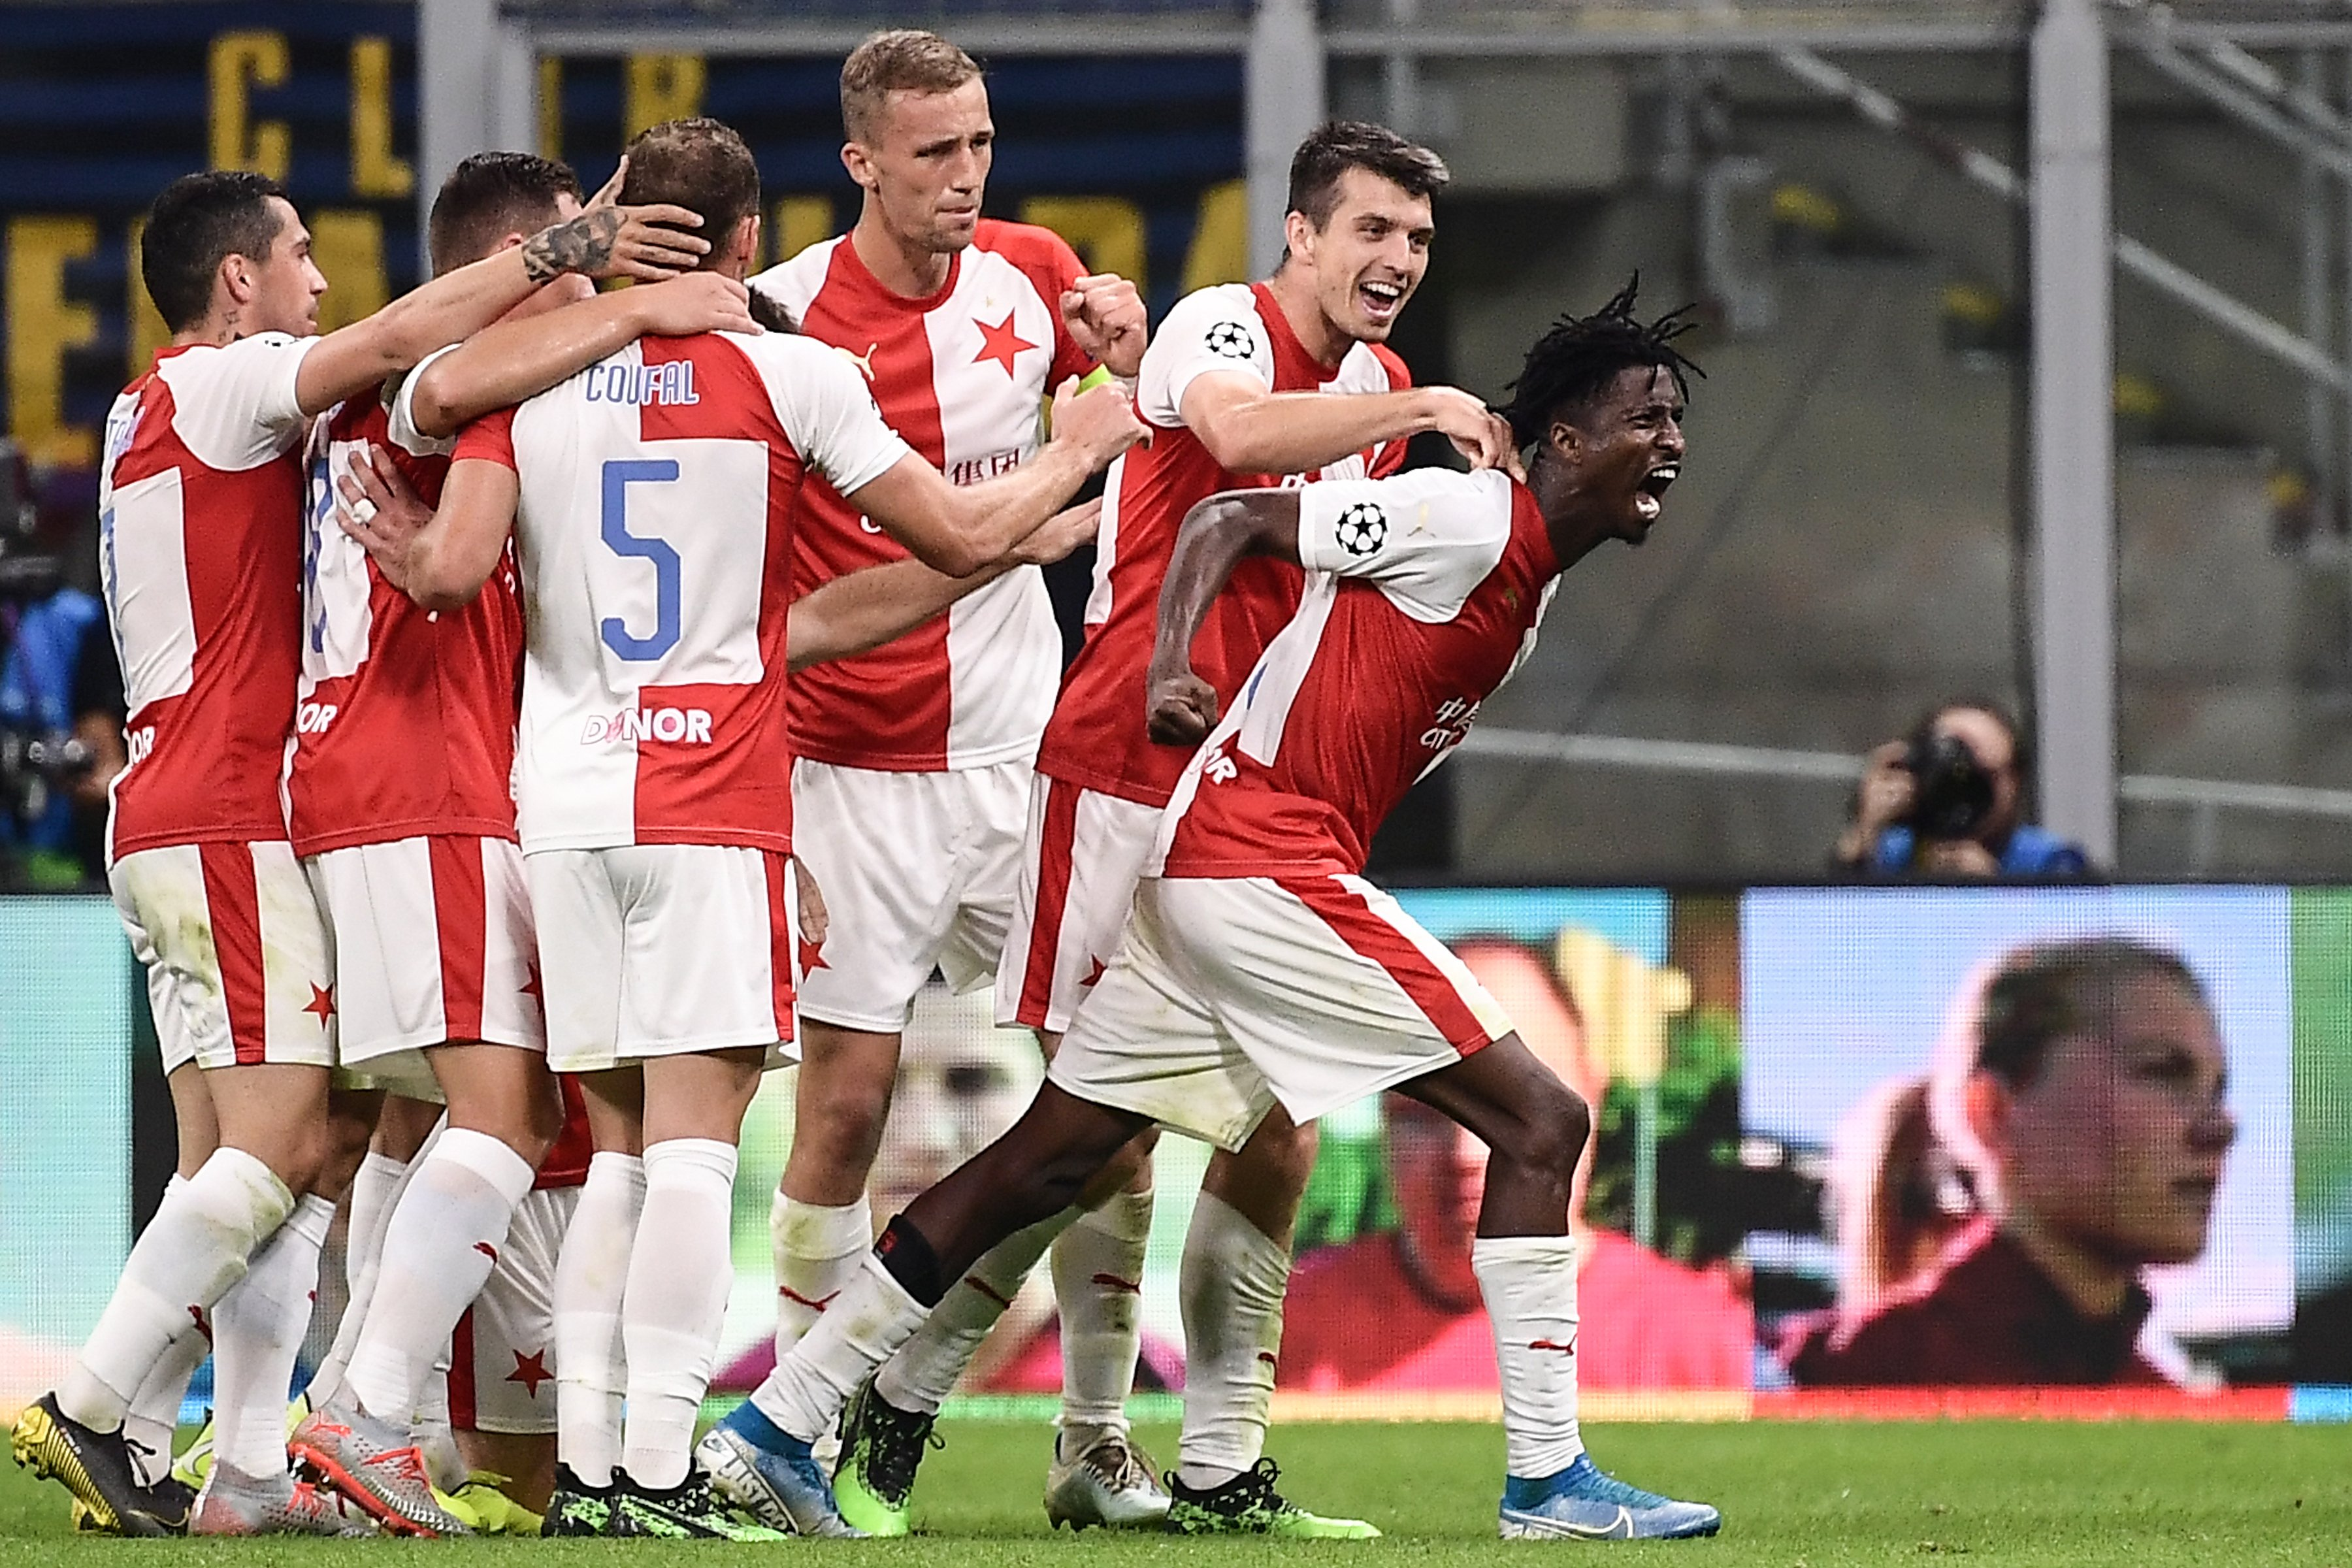 Champions League: Olayinka Scores In Slavia Prague Away Draw At Inter, Abraham,  Osimhen,  Onuachu Caged